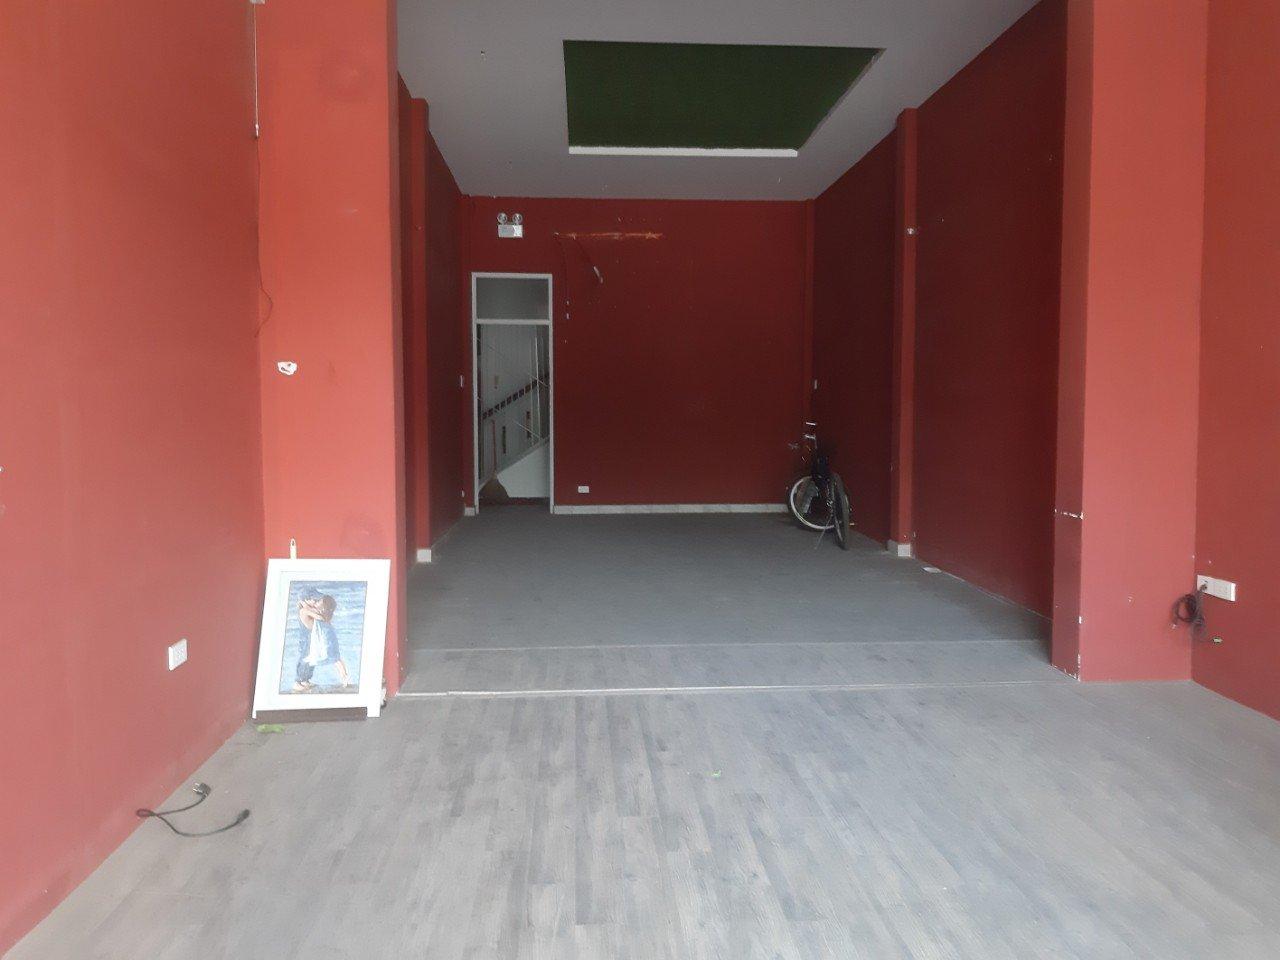 2-floor restaurant for rent in Ngu Hanh Son Da Nang